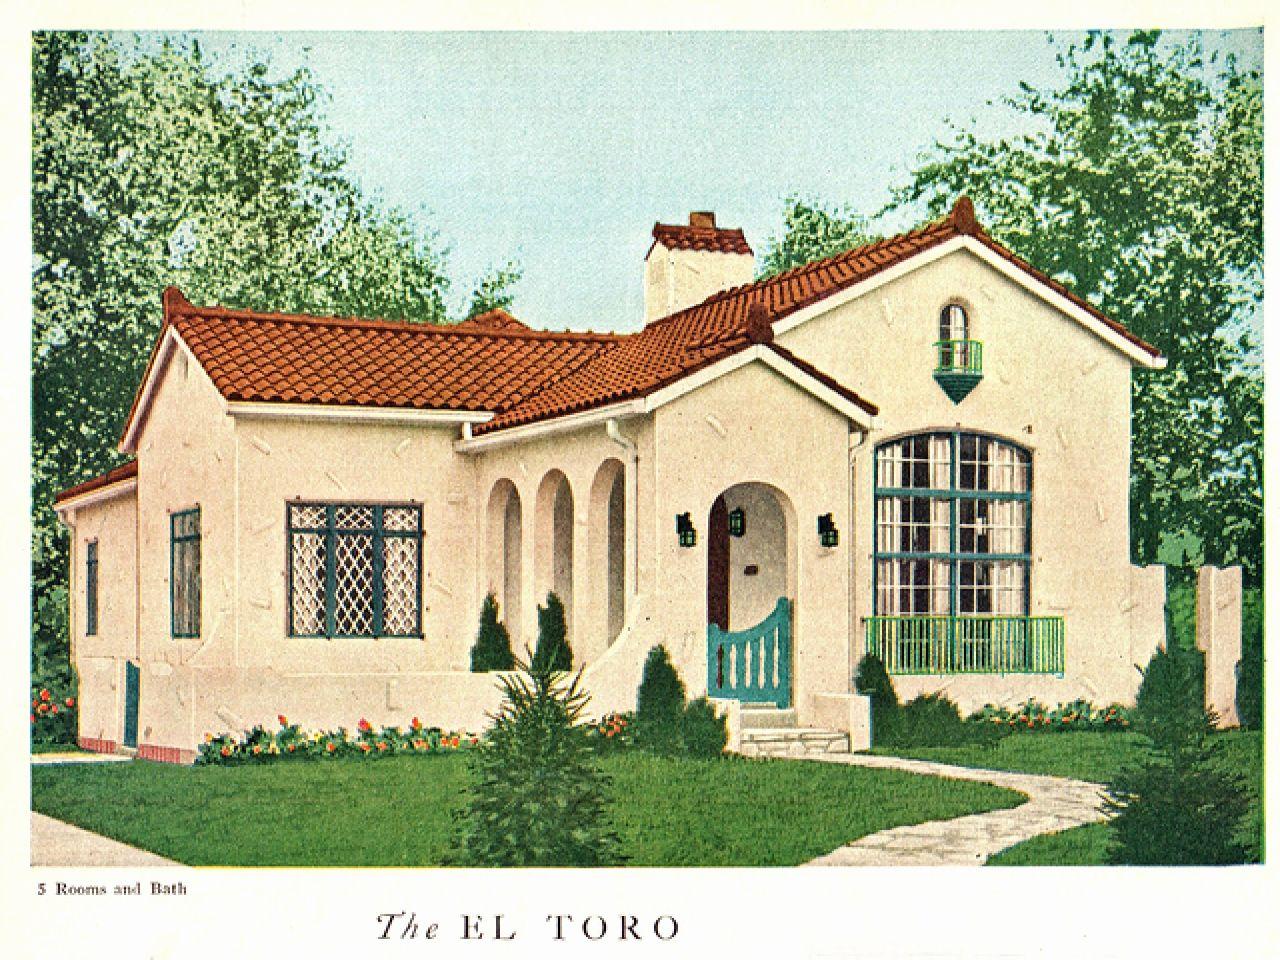 Spanish Colonial 2 Story House Plans Lovely Floor Spanish Revival Plans Design 1920 30s 2 Story Flori Spanish Revival Home Spanish Bungalow Spanish Style Homes